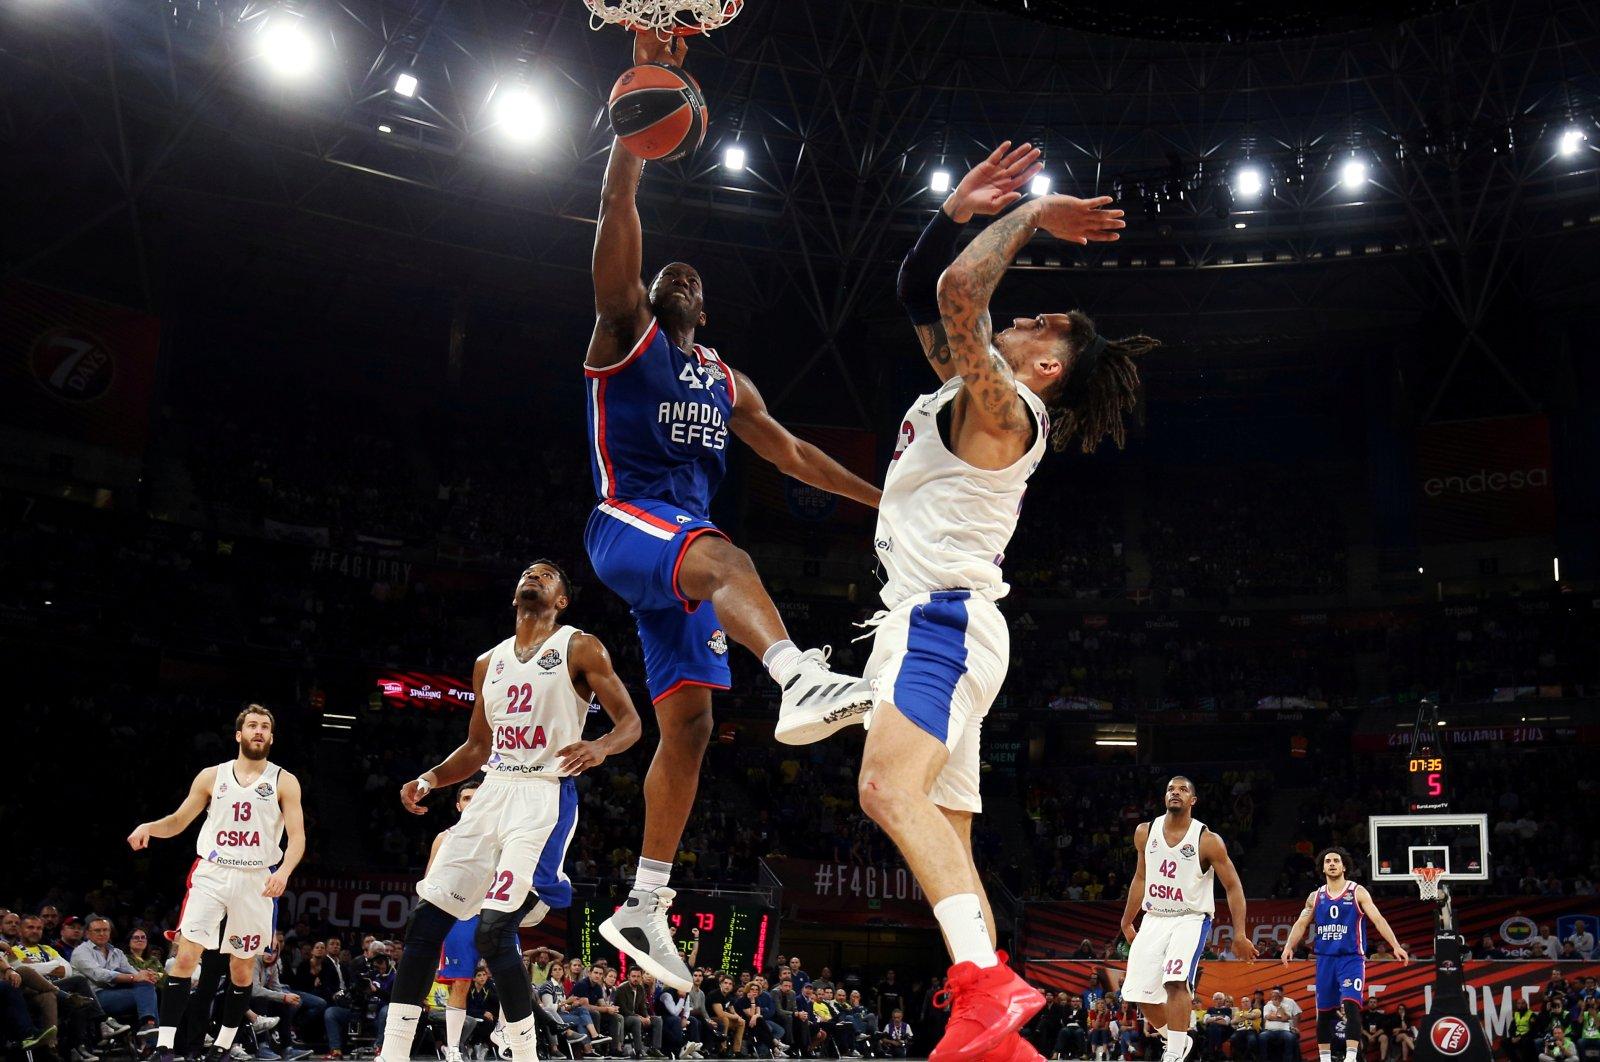 Anadolu Efes' Bryant Dunston dunks on CSKA Moscow's Daniel Hackett during the EuroLeague Final Four final game at Fernando Buesa Arena, Vitoria-Gasteiz, Spain, May 19, 2019. (Reuters Photo)